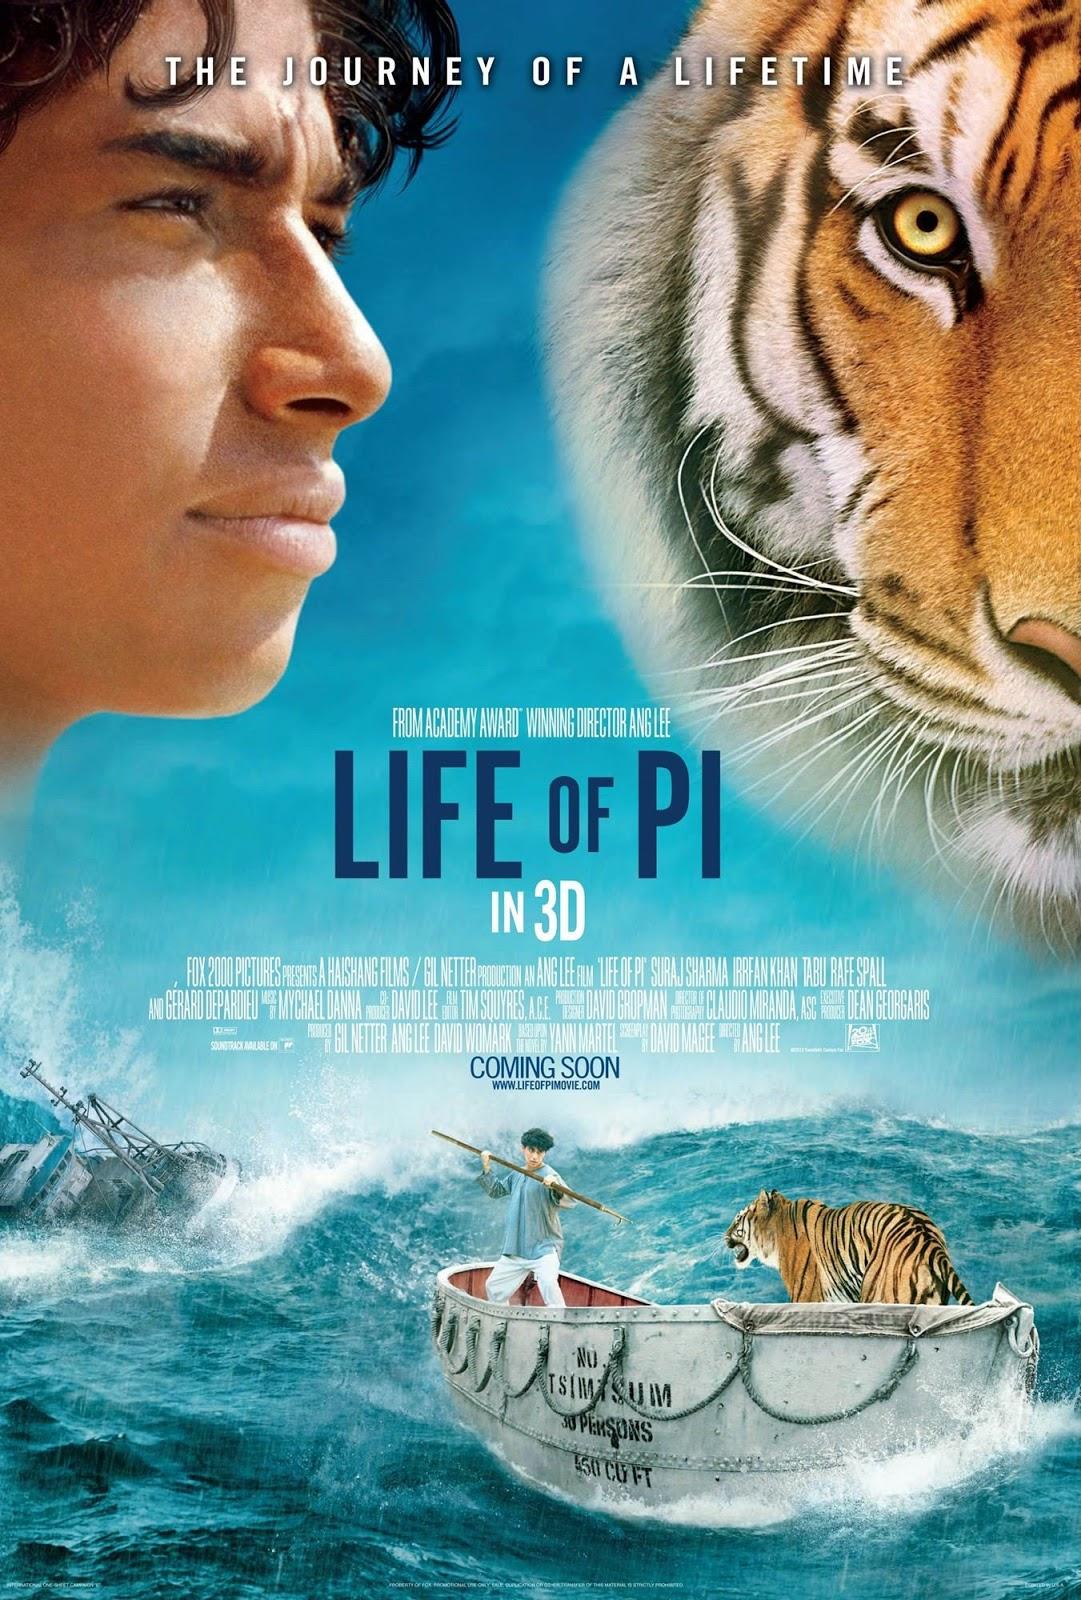 Life Of Pi 2012 Dvdrip Xvid Ptpower Legendas Pt